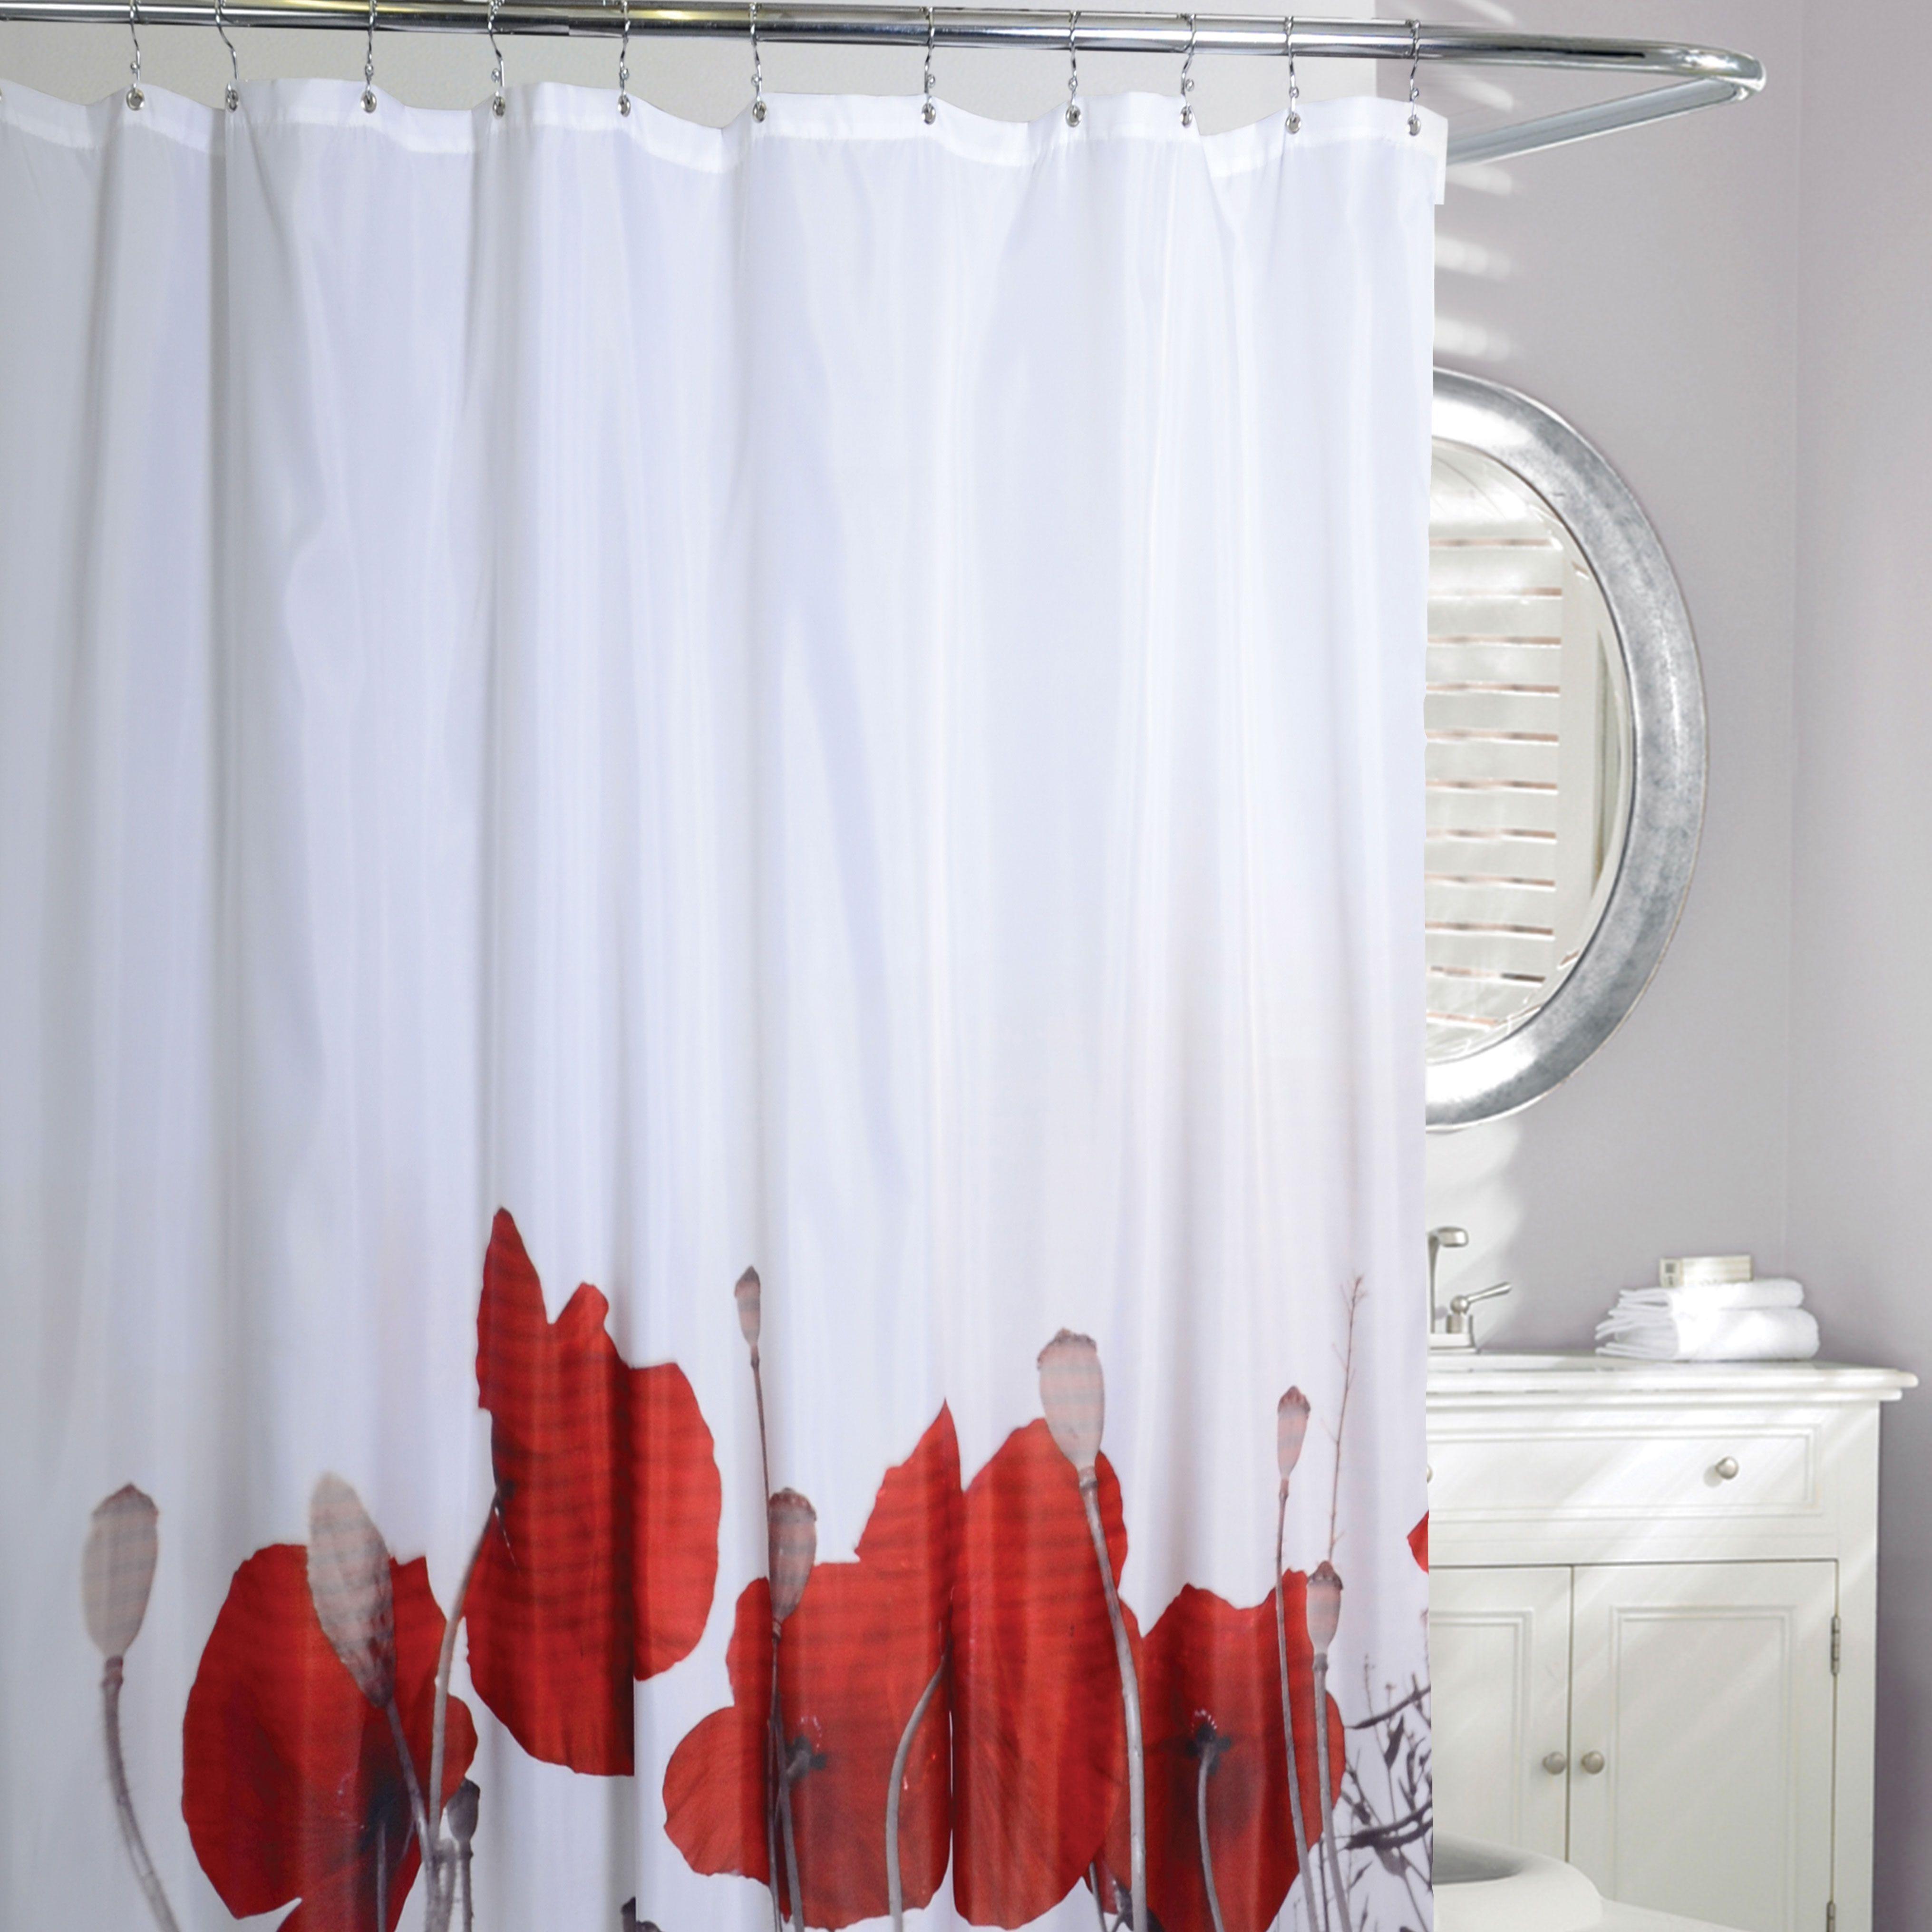 linen chest rideau de douche en tissu Â« poppy fields Â